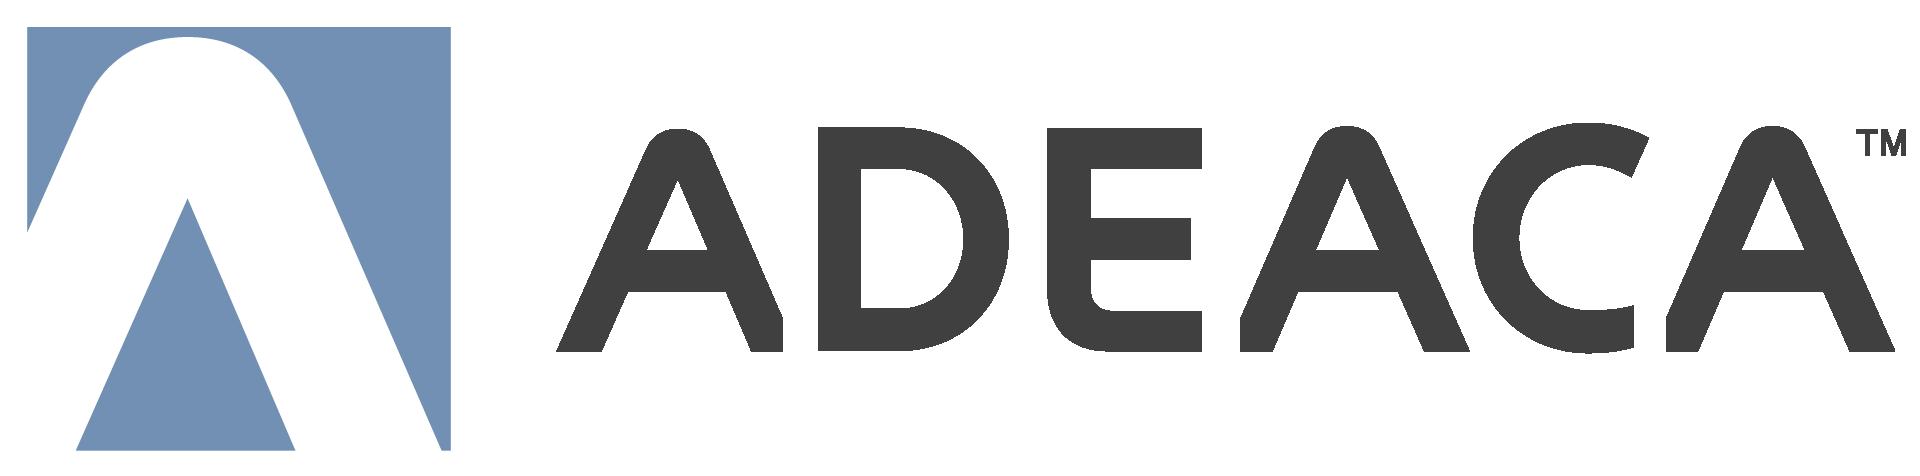 Matt Mong of Adeaca Clarifies Manufacturing Confusion Between Process Versus Project